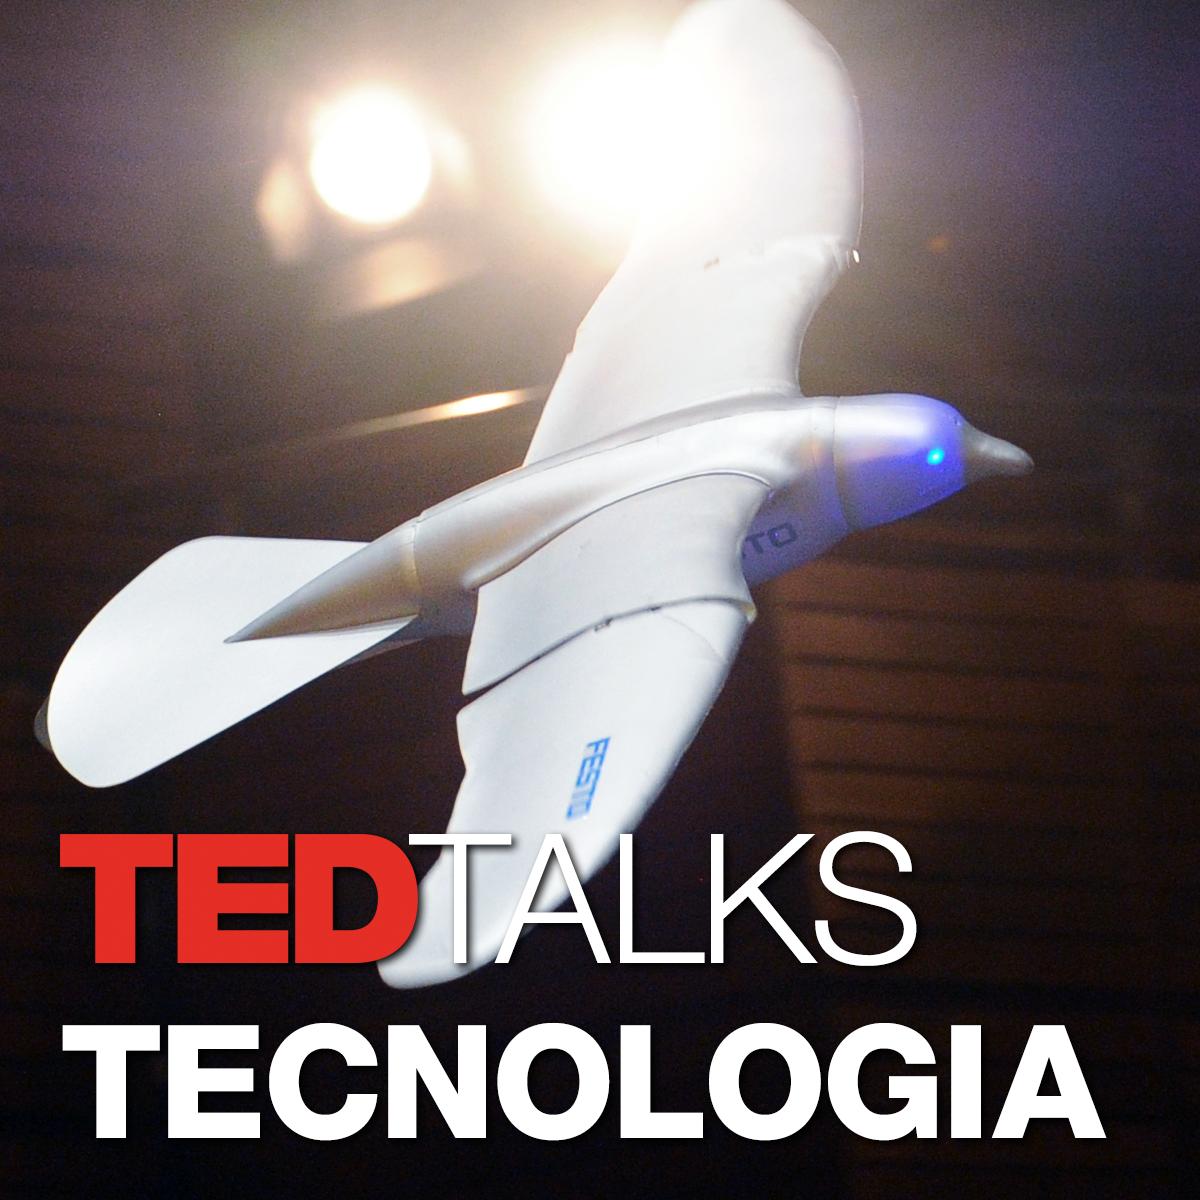 TEDTalks Tecnologia